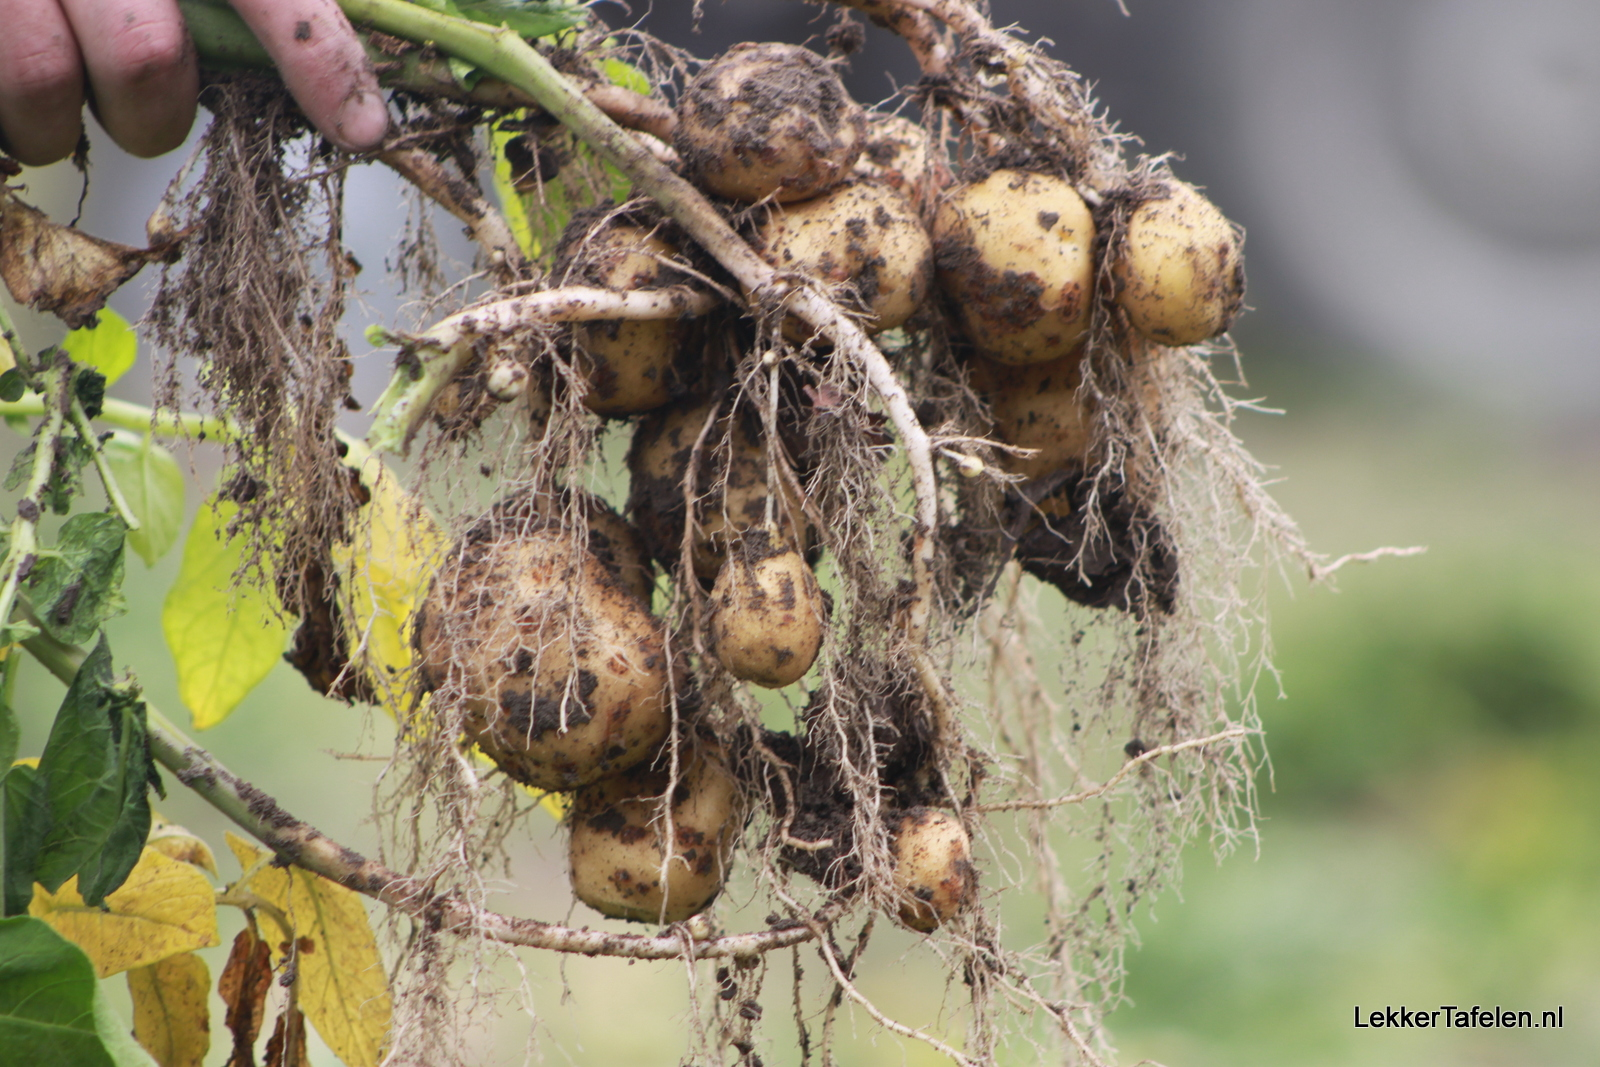 Opperdoezer Ronde - Opperdoes - Noord-Holland - aardappel - aardappels - Beschermde Oorsprongsbenaming 7719